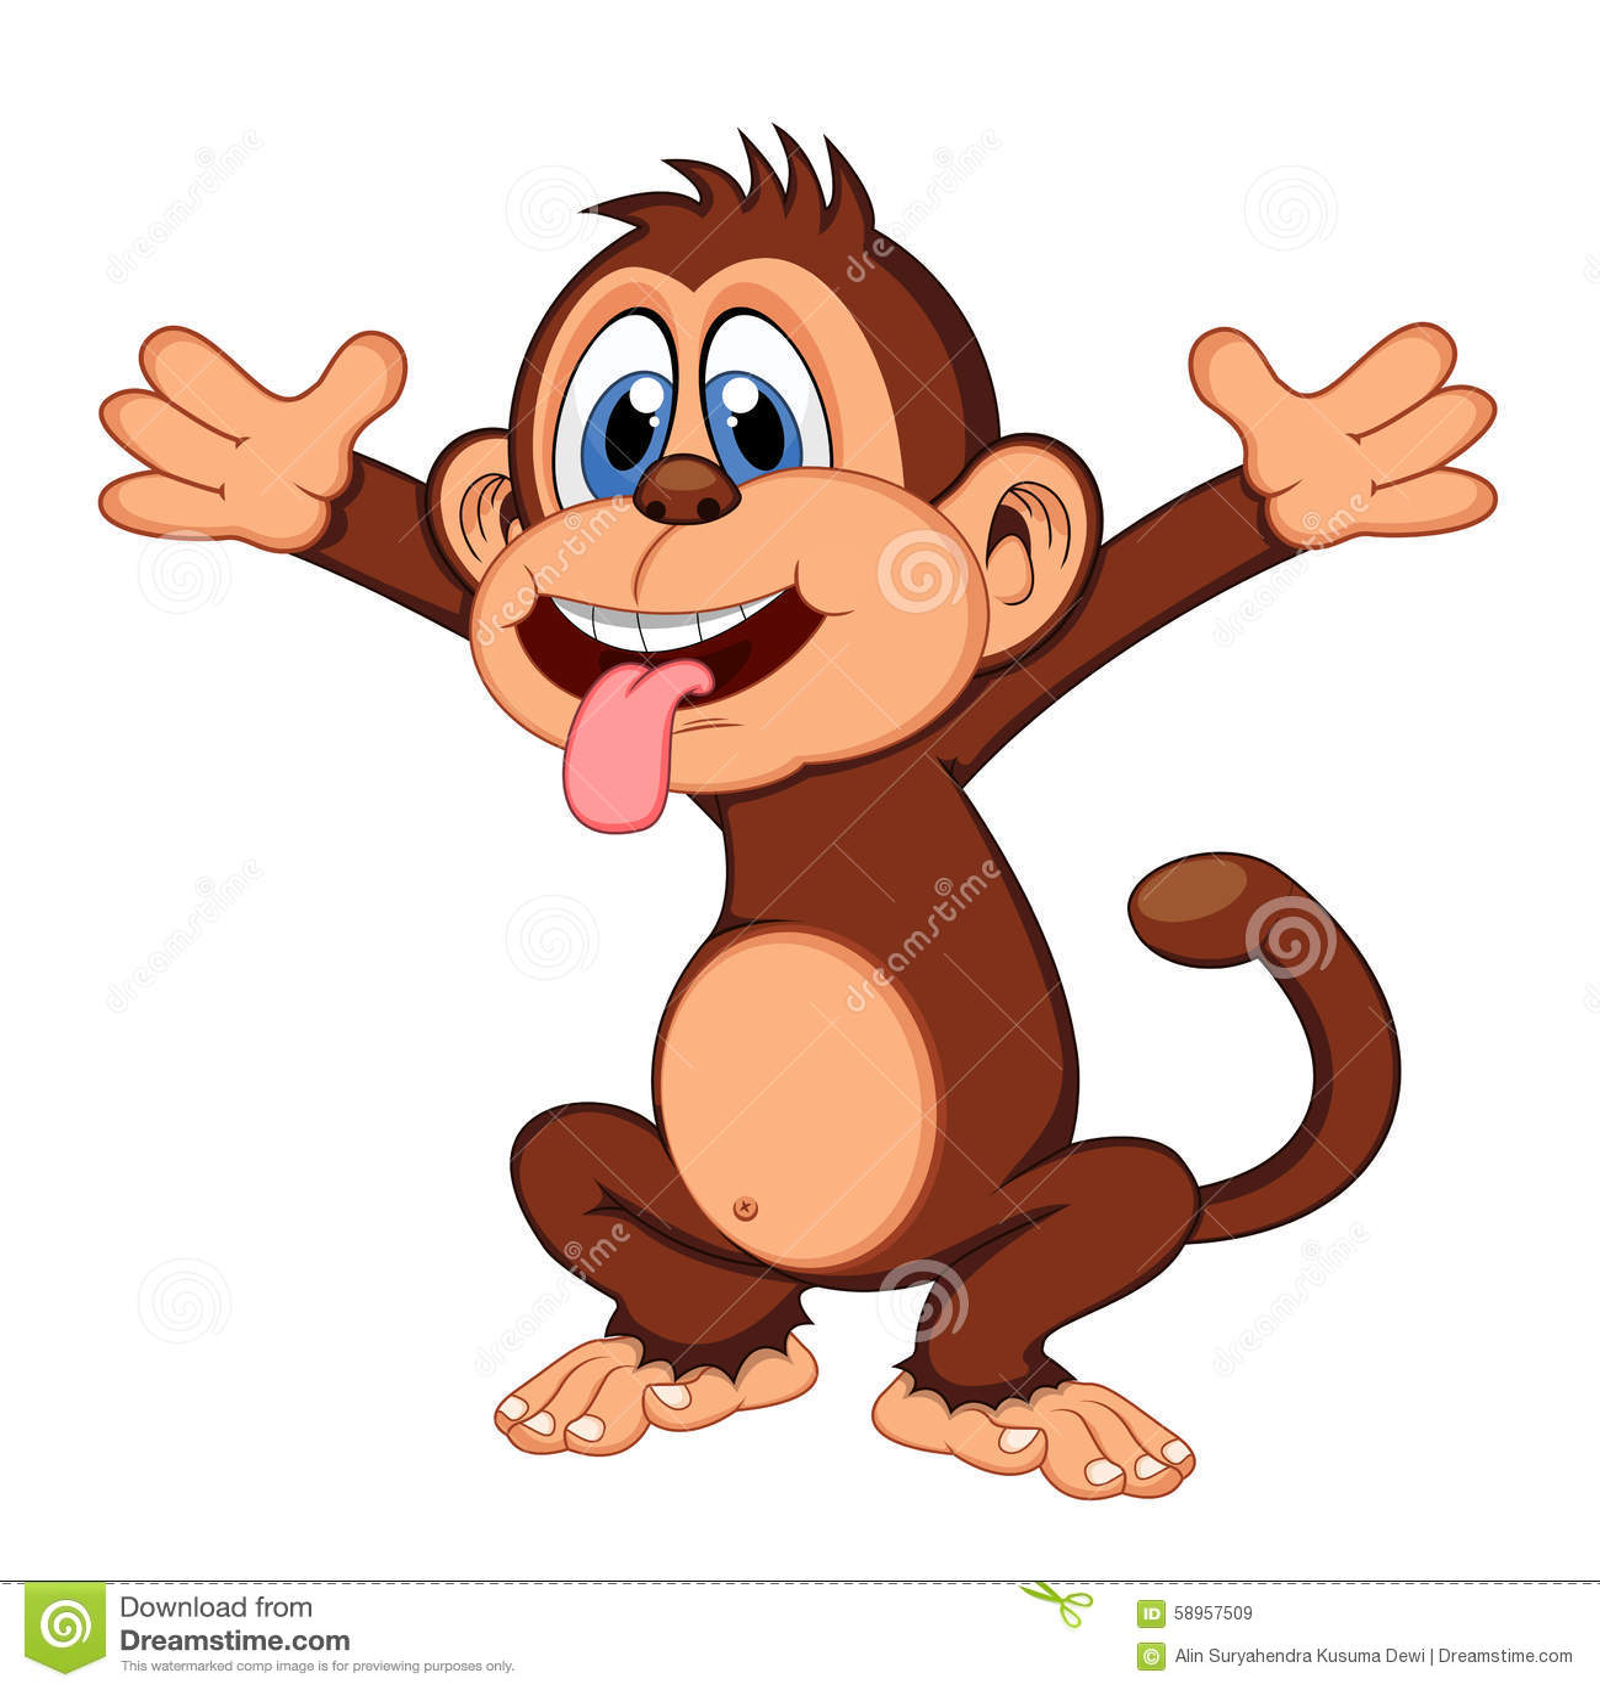 Monkey Cartoon Stock Vector. Image Of Drawing, Happy